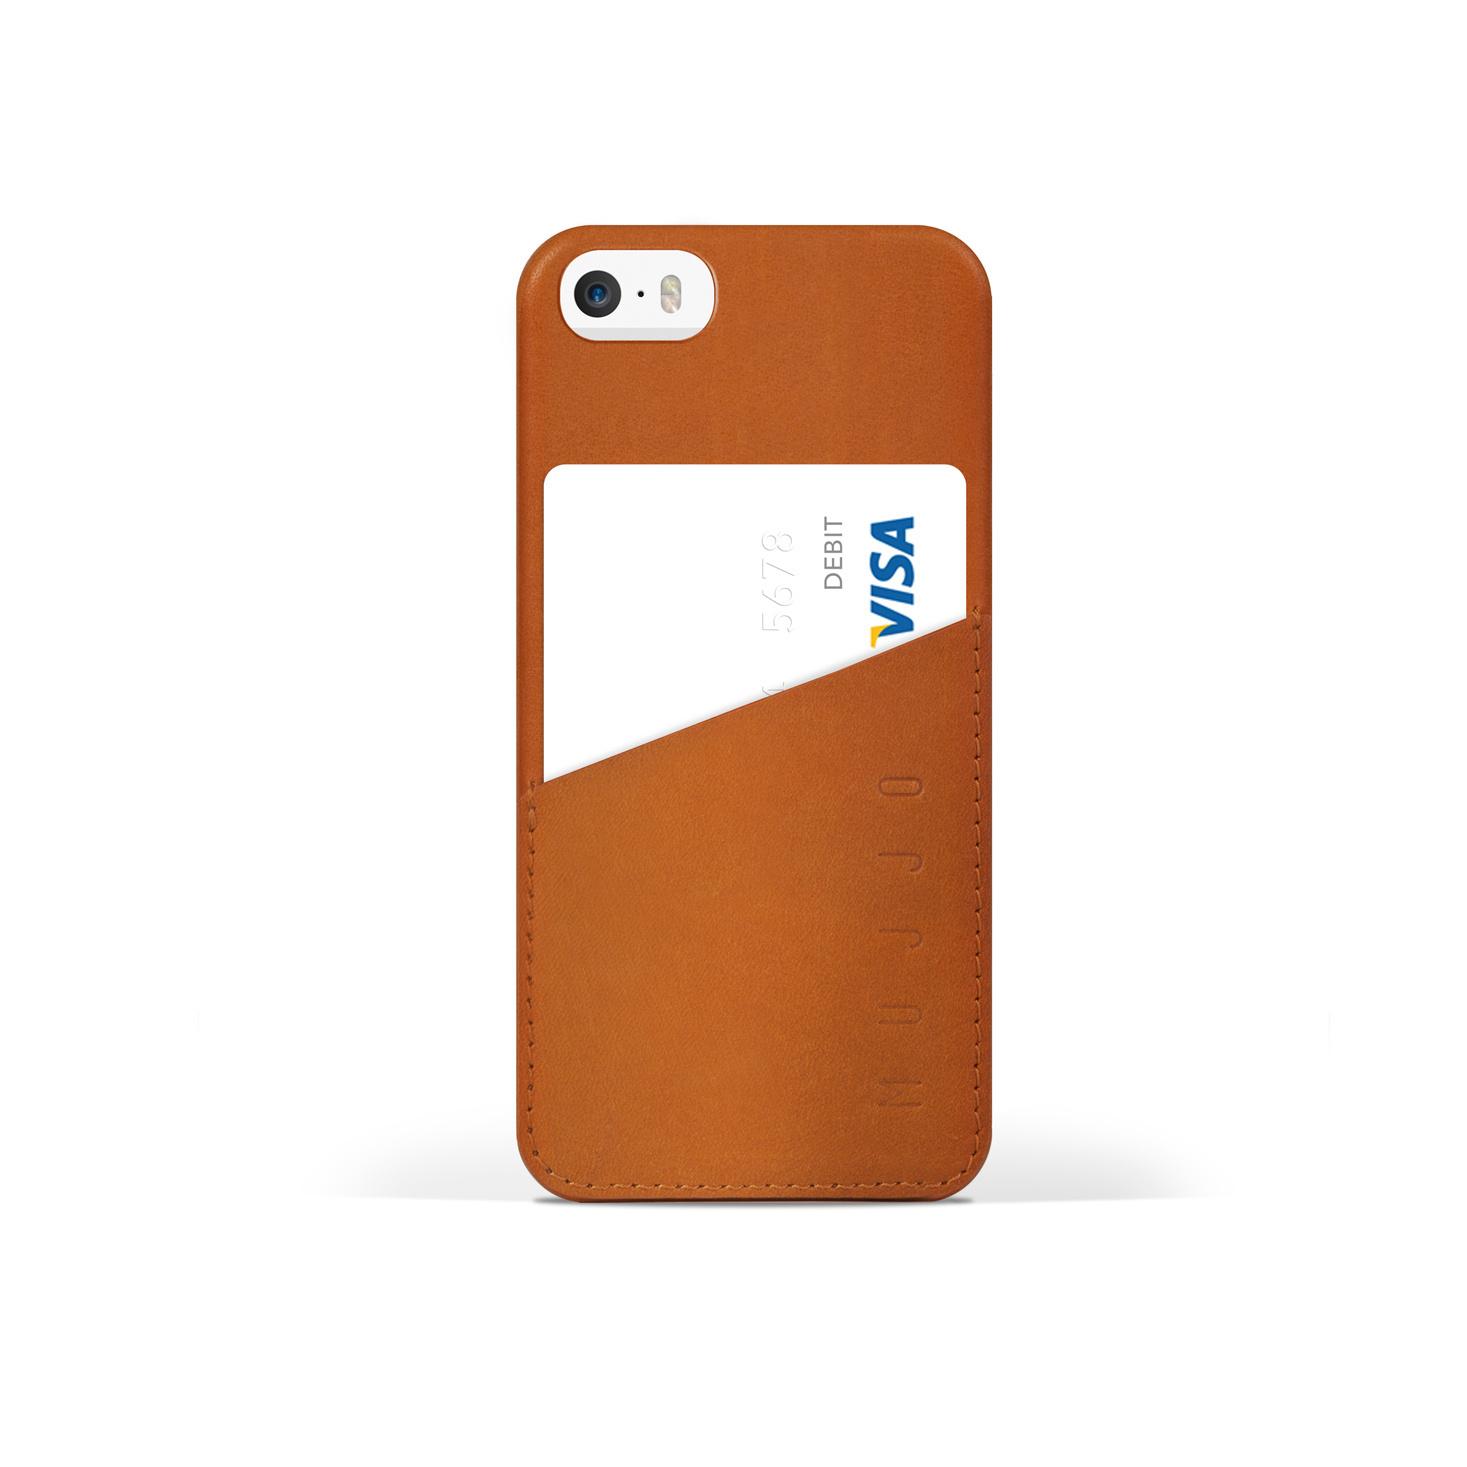 Mujjo iphone 6s/5S 皮质保护套钱包夹 棕褐色